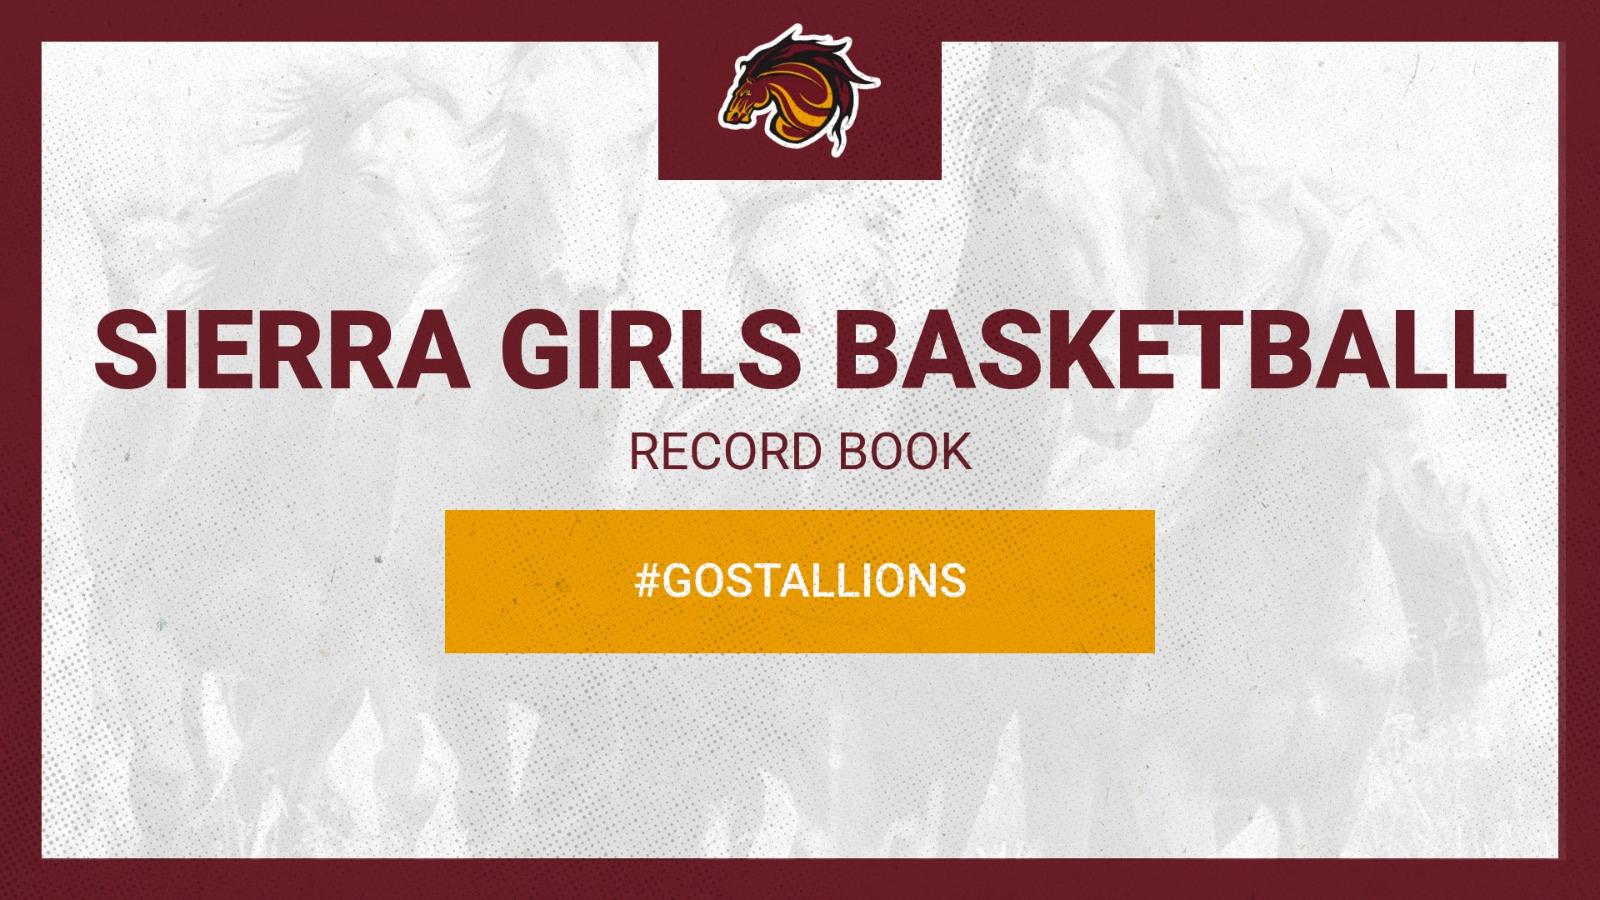 Sierra Girls Basketball History Stats (Season and Career )